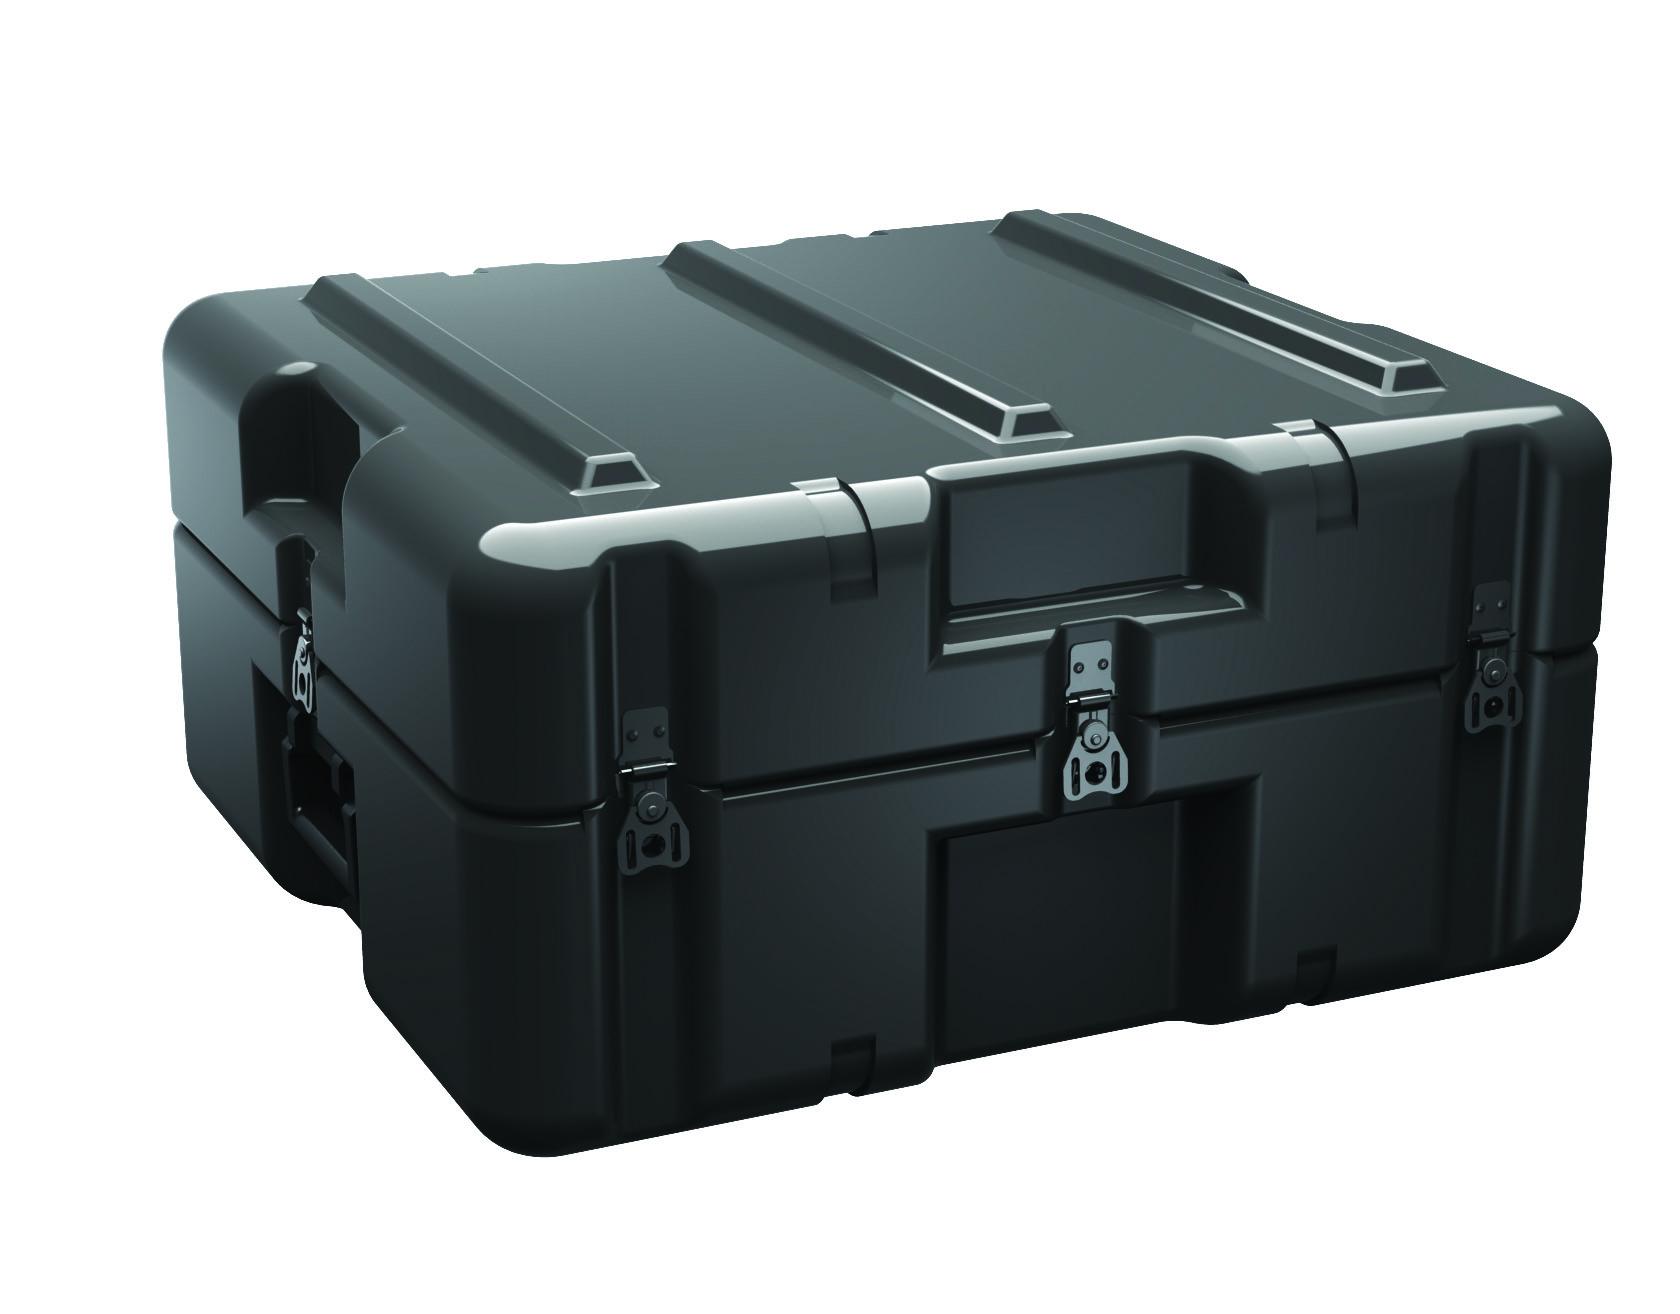 AL2221-0605 - AL2221-0605 Pelican Flat Case Shipping  Case